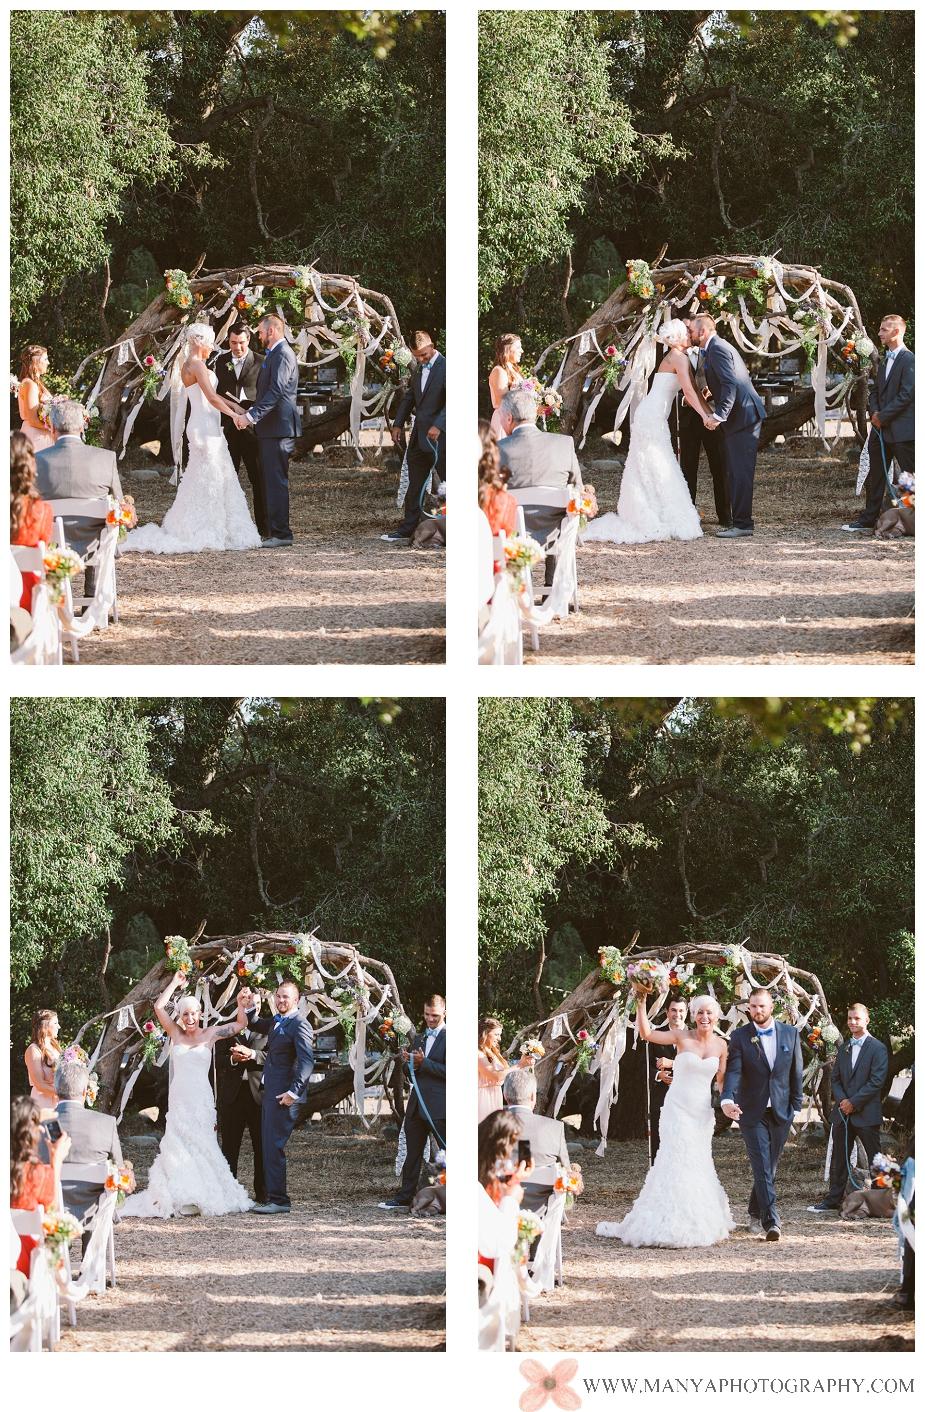 2013-08-15_0102 - Orange County Wedding Photographer